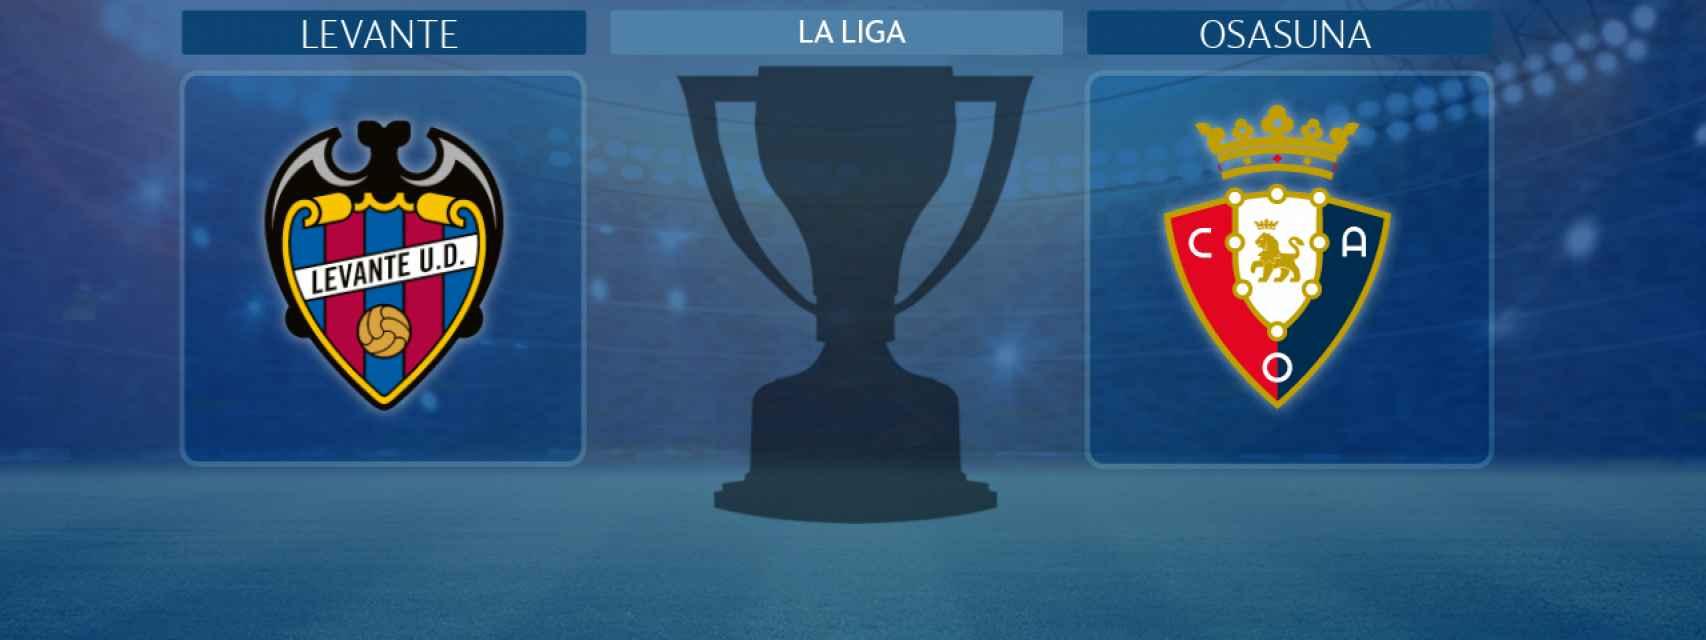 Levante - Osasuna, partido de La Liga